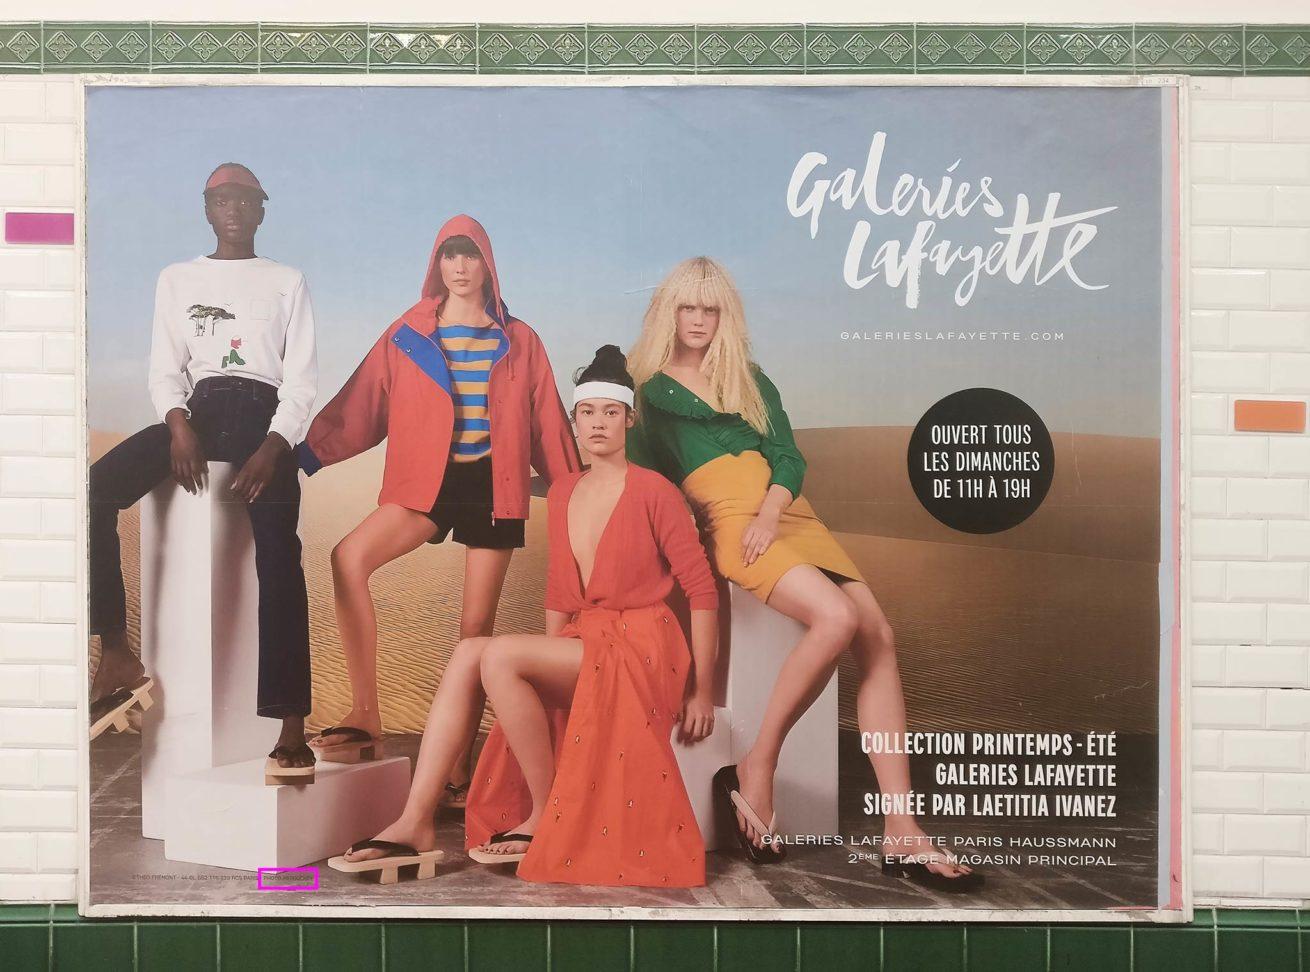 Metro station advertising with retouching lable for Galeries Lafayette - Printemps - Été Collection Paris